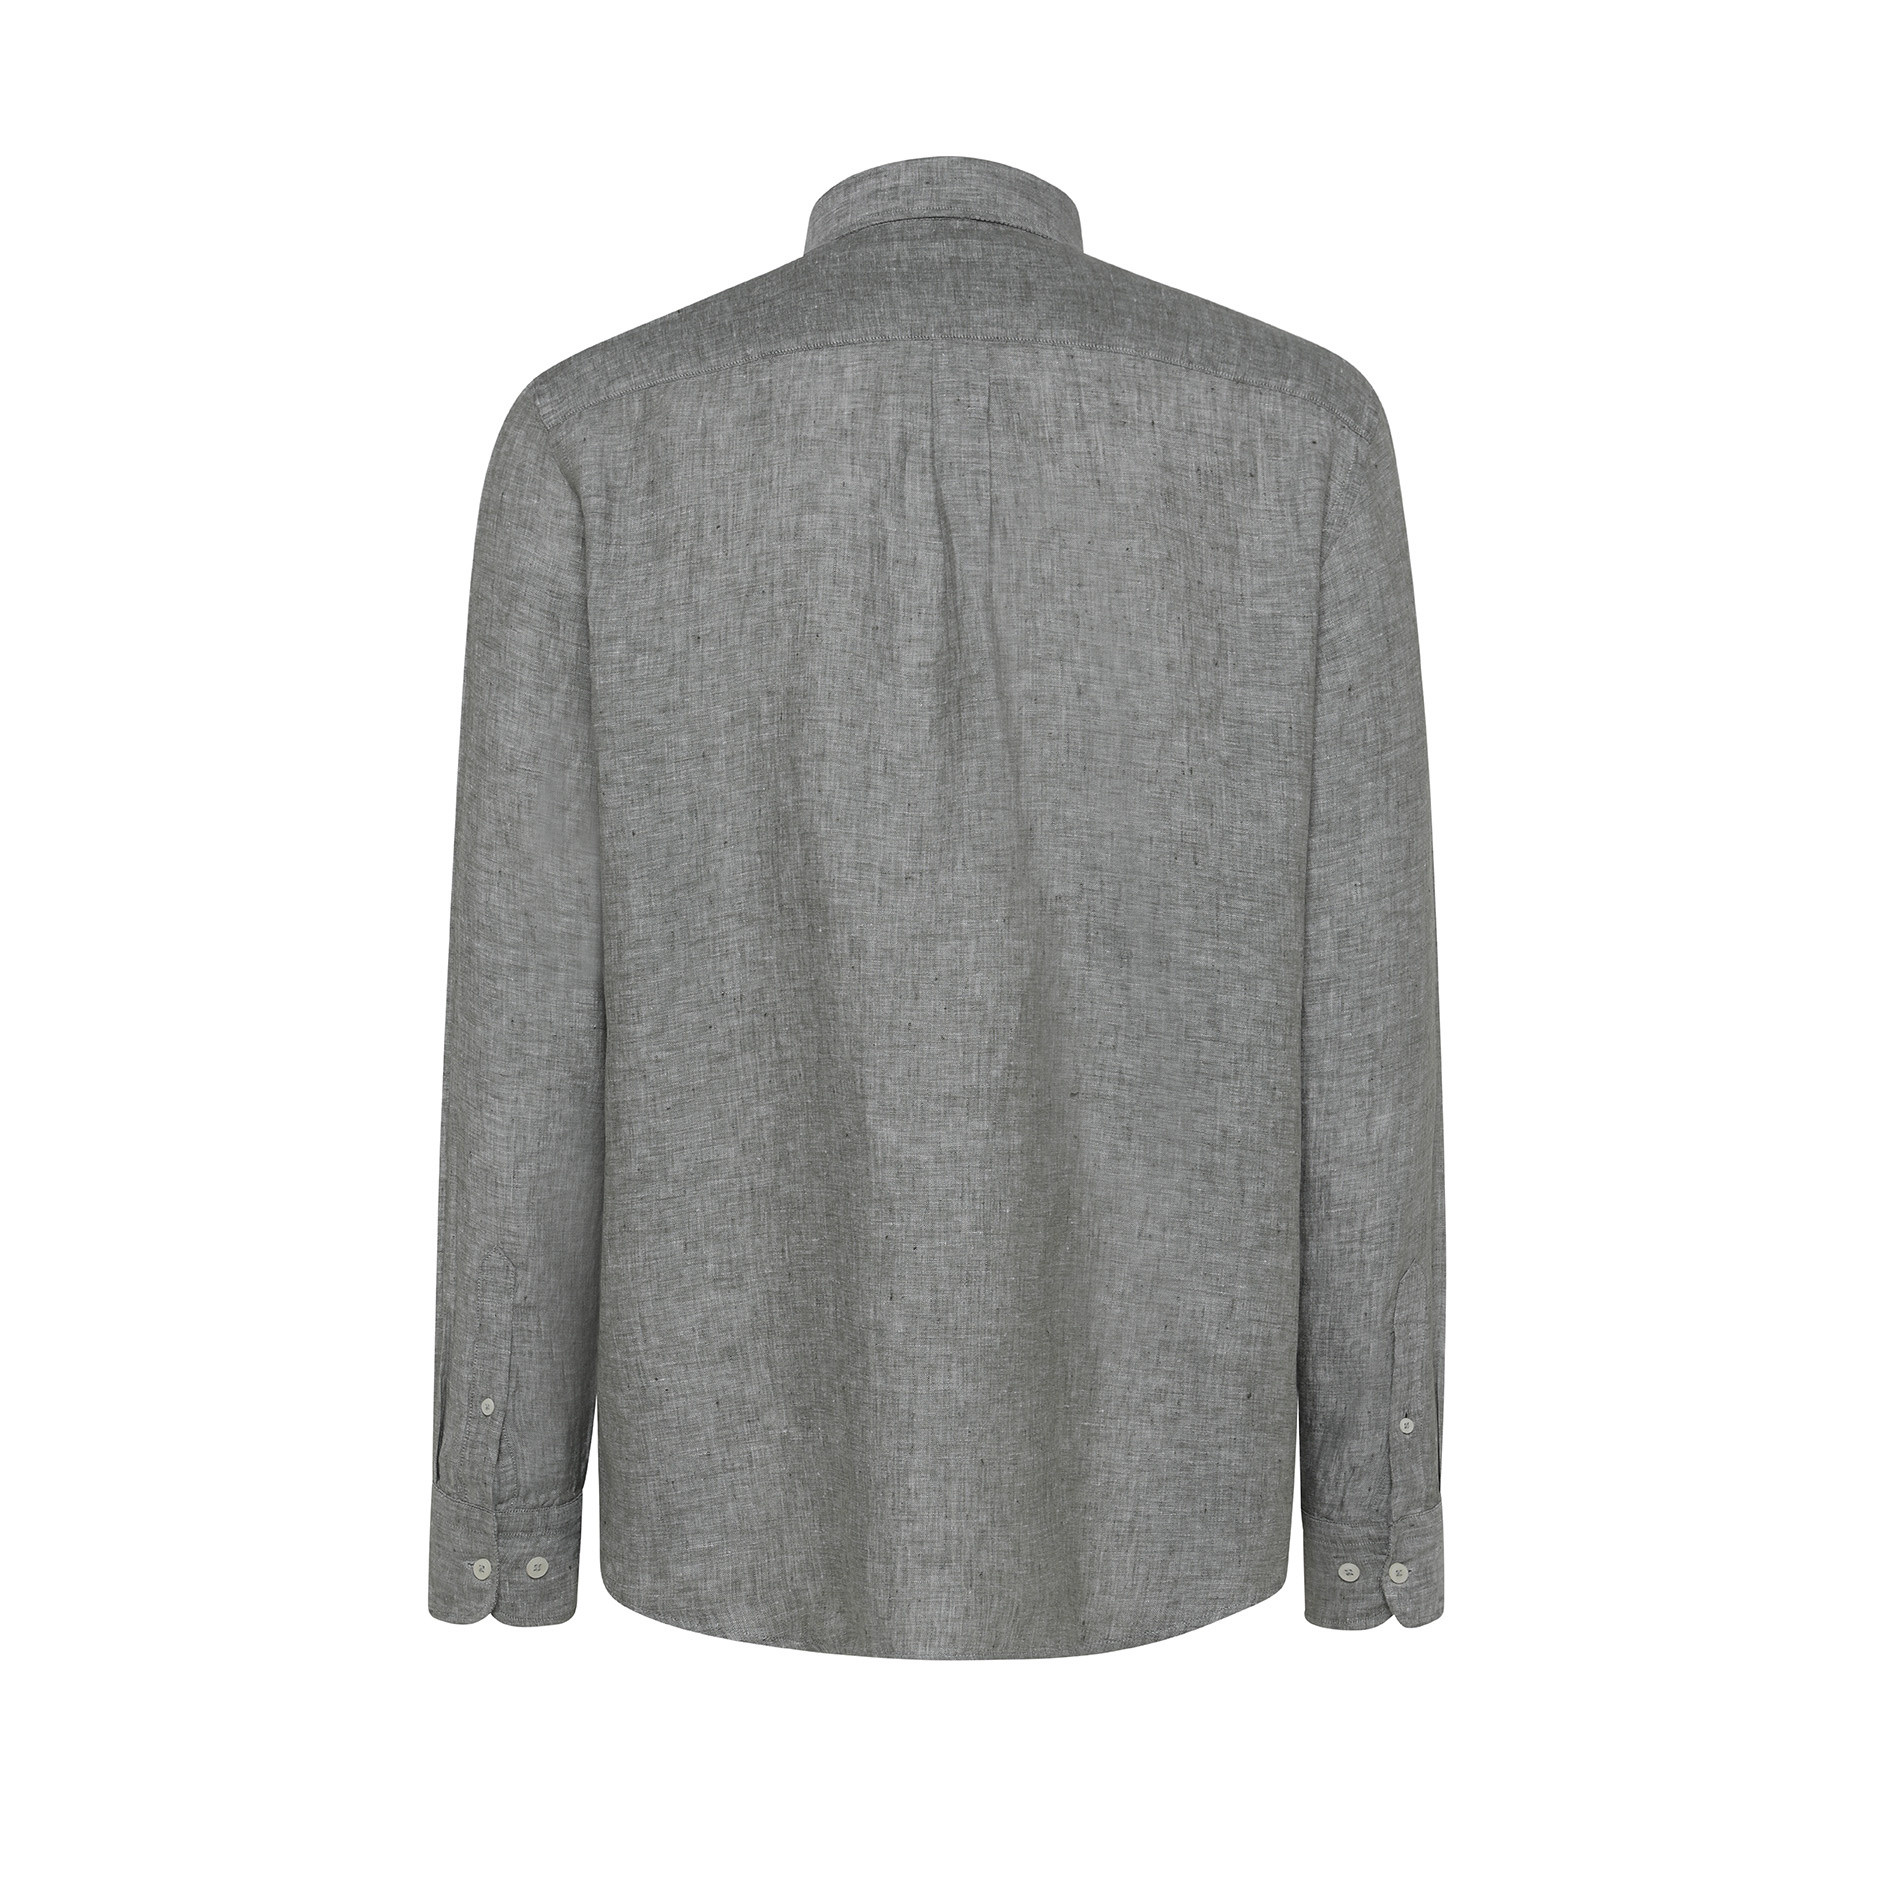 Camicia puro lino tailor fit Luca D'Altieri, Verde opale, large image number 1